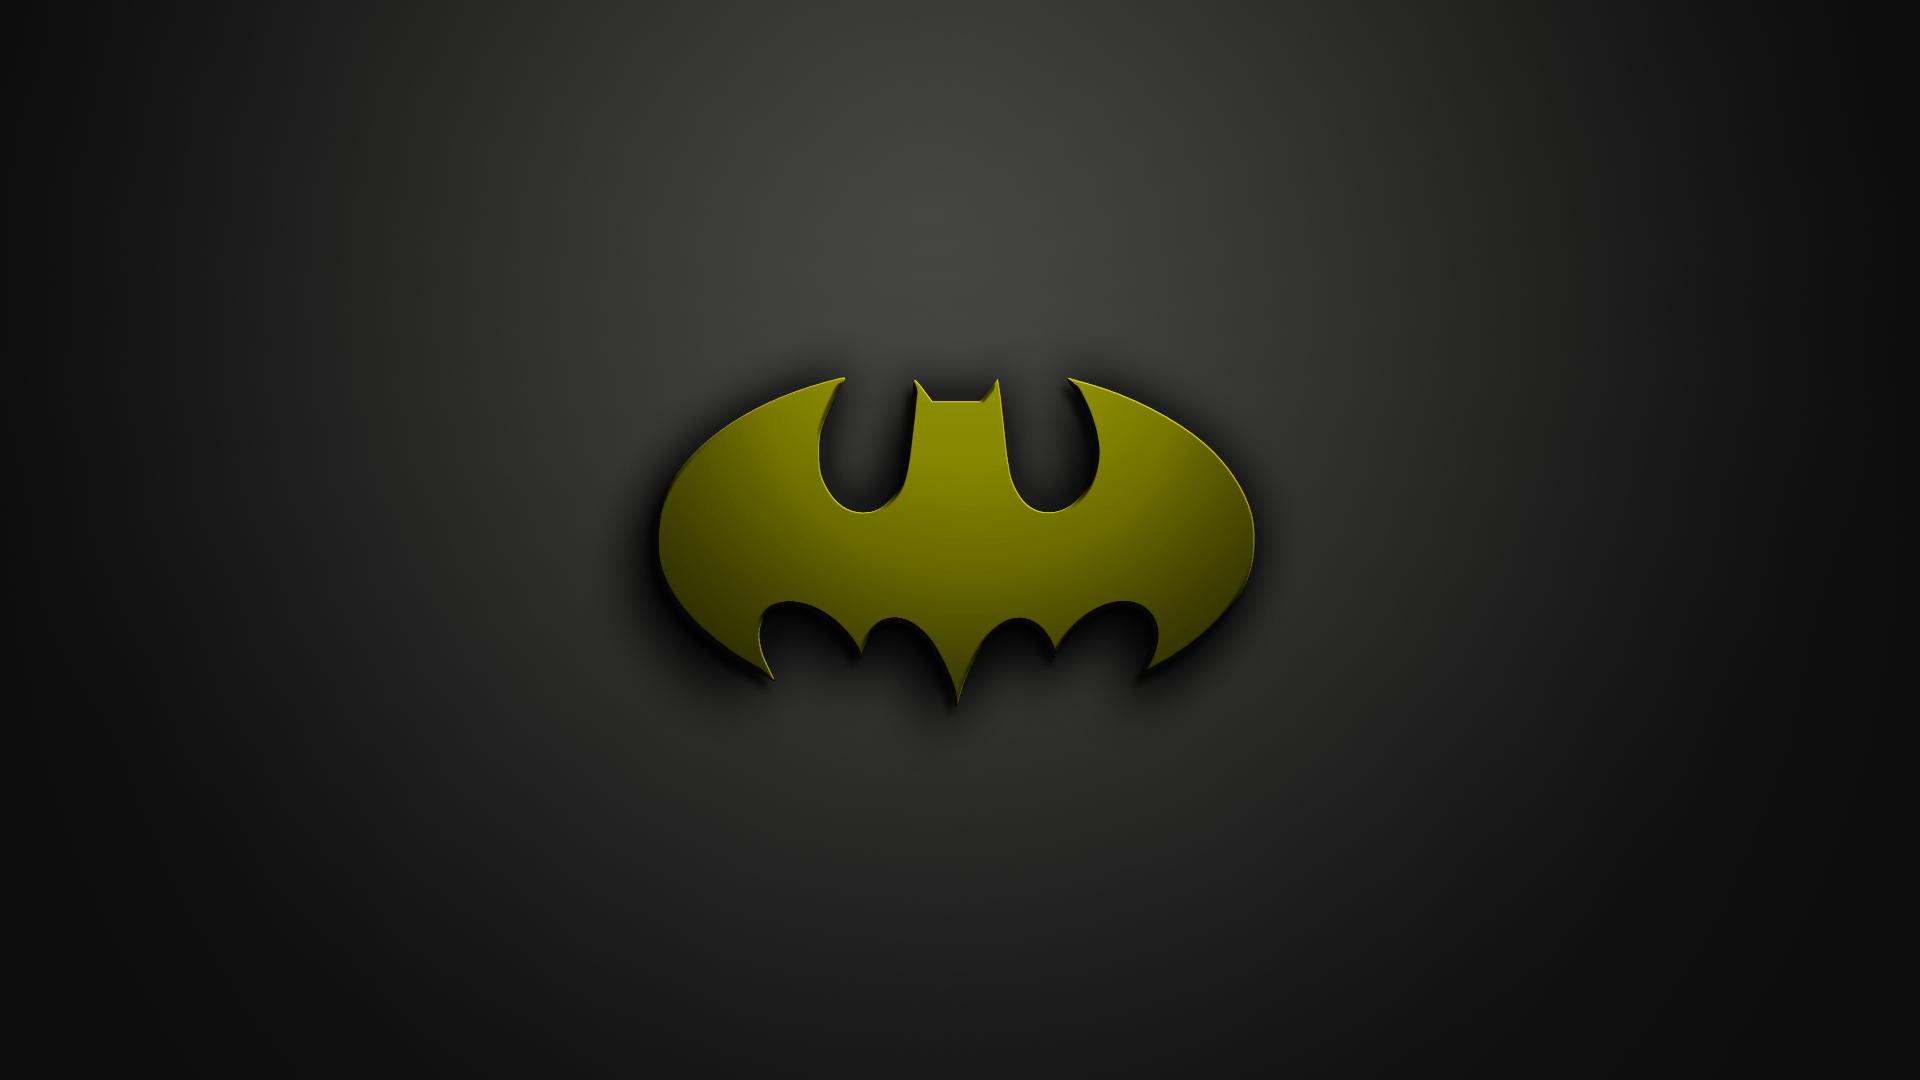 Batman Symbol Hd Superheroes 4k Wallpapers Images Backgrounds